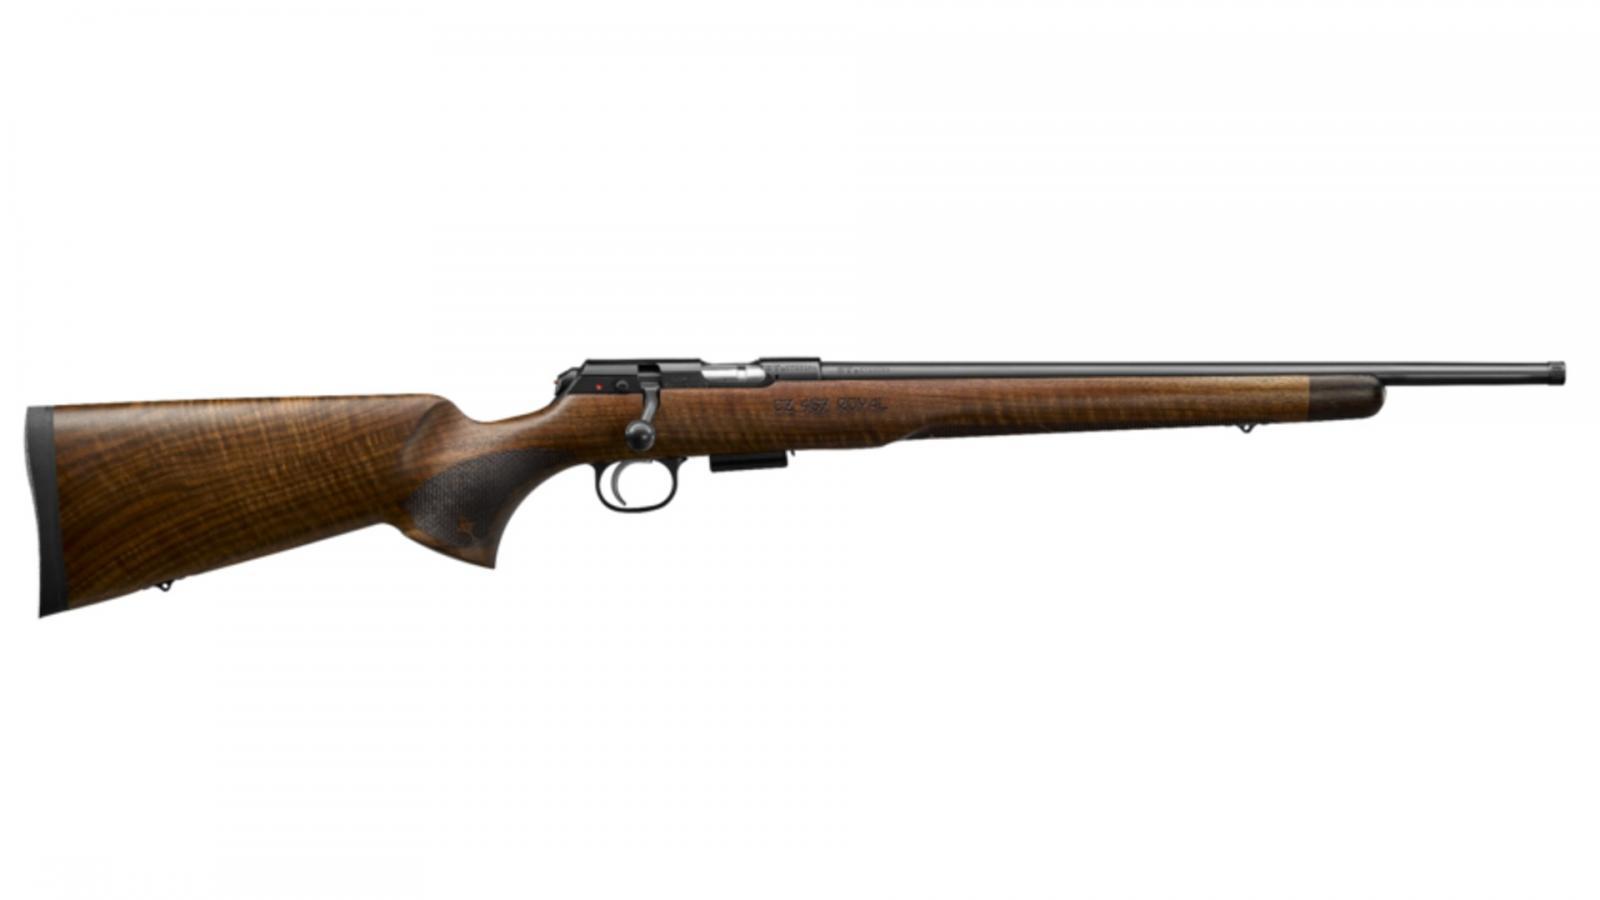 Carabine CZ 457 ROYAL Cal 22LR